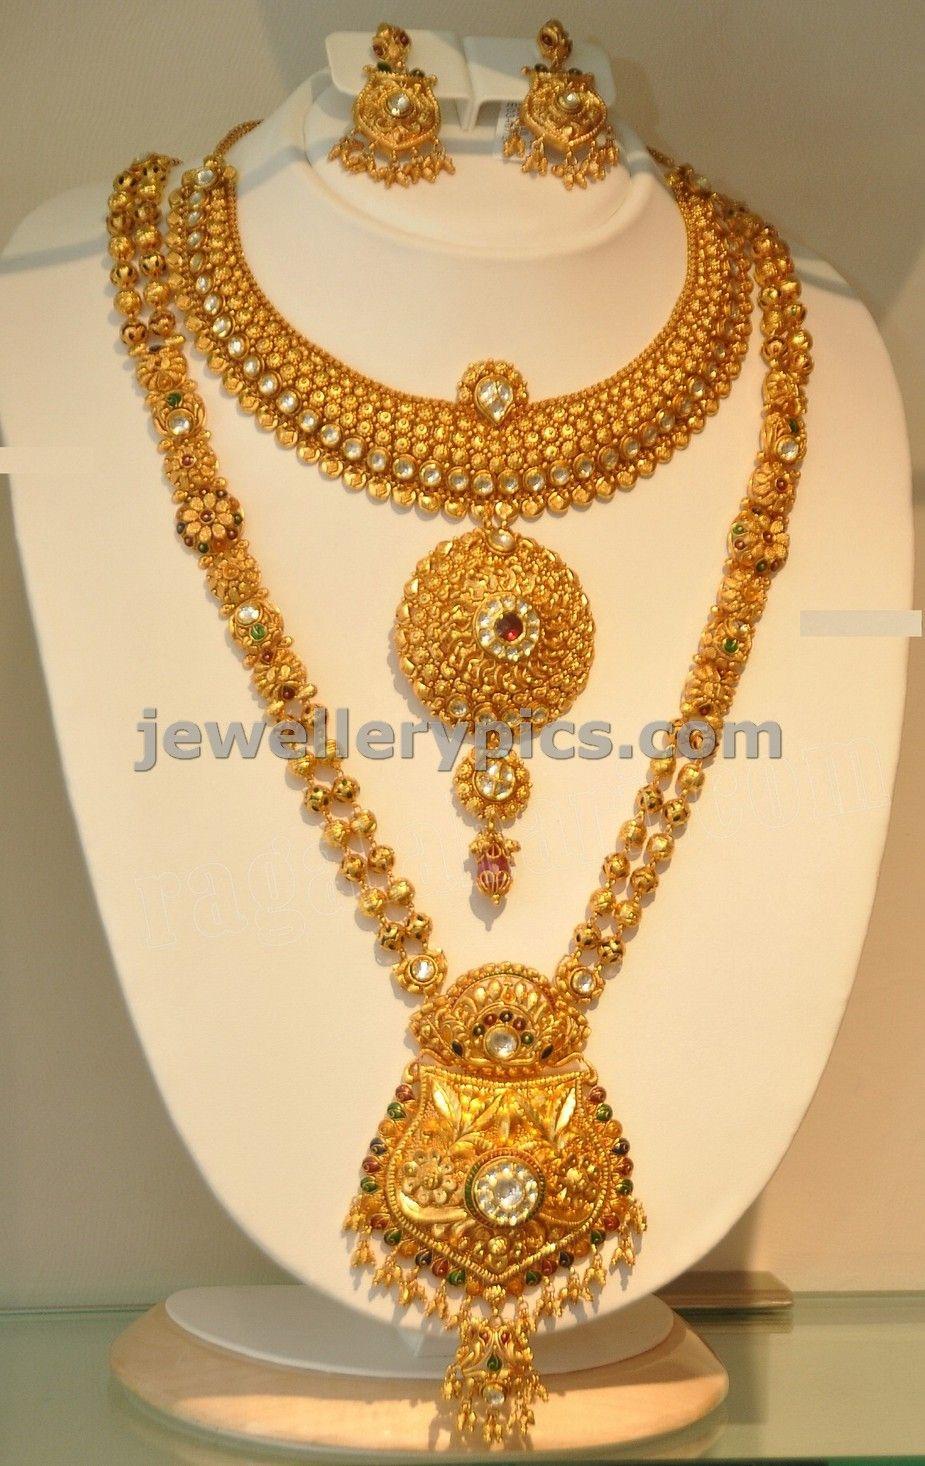 Outstanding Khazana Gold Haram Long Necklace Designs Latest Jewellery Short Hairstyles For Black Women Fulllsitofus